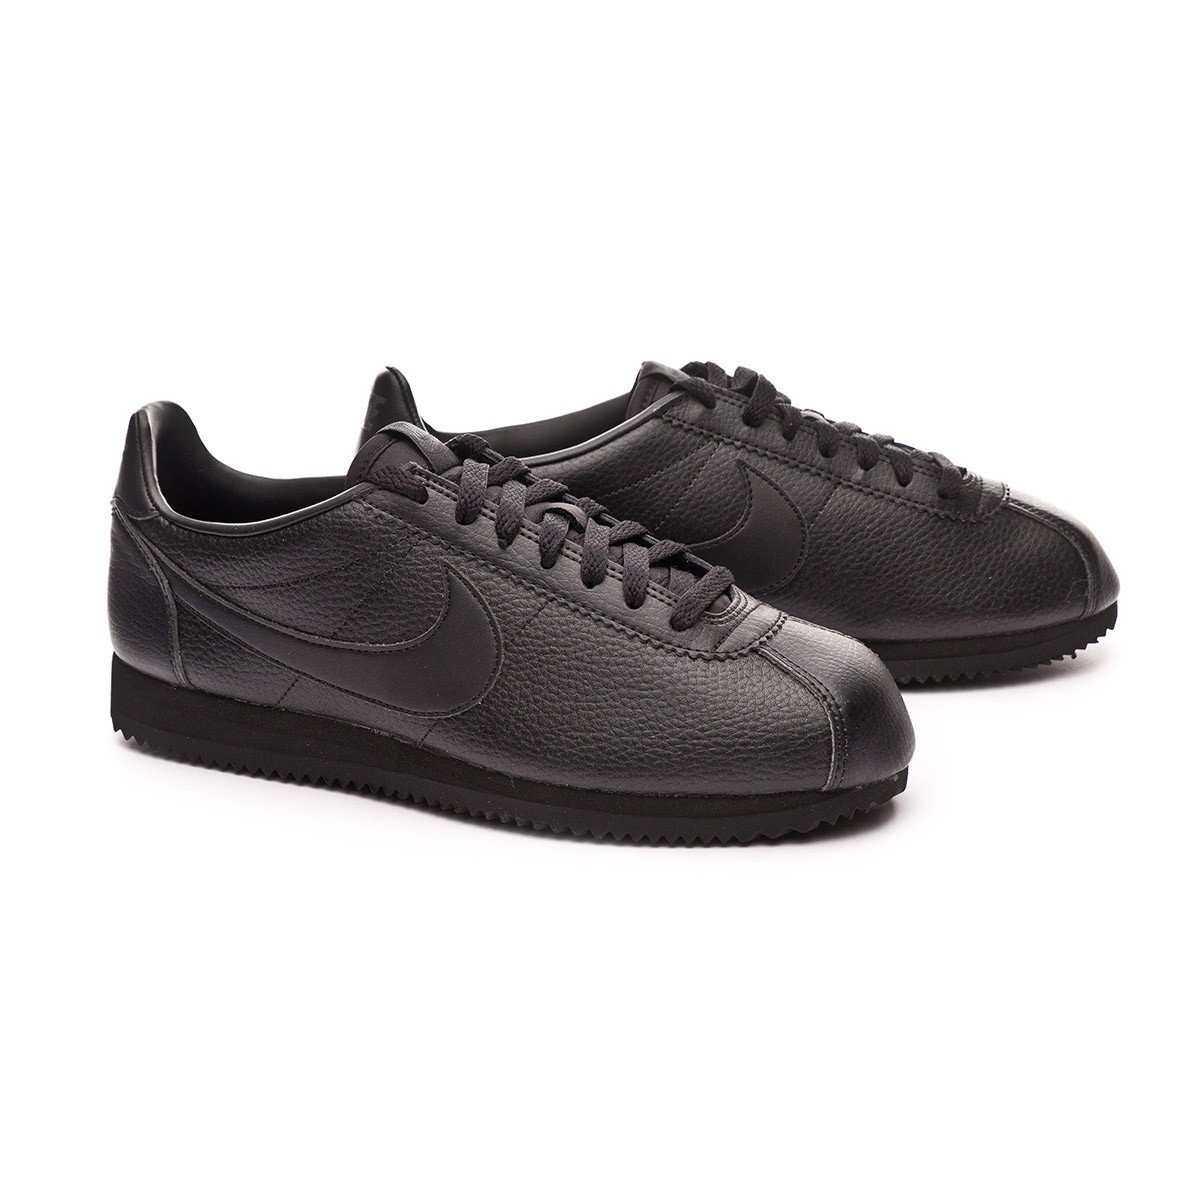 7637ed7ac3367 Zapatilla Nike Classic Cortez Leather 2019 Black-Anthracite - Tienda de  fútbol Fútbol Emotion